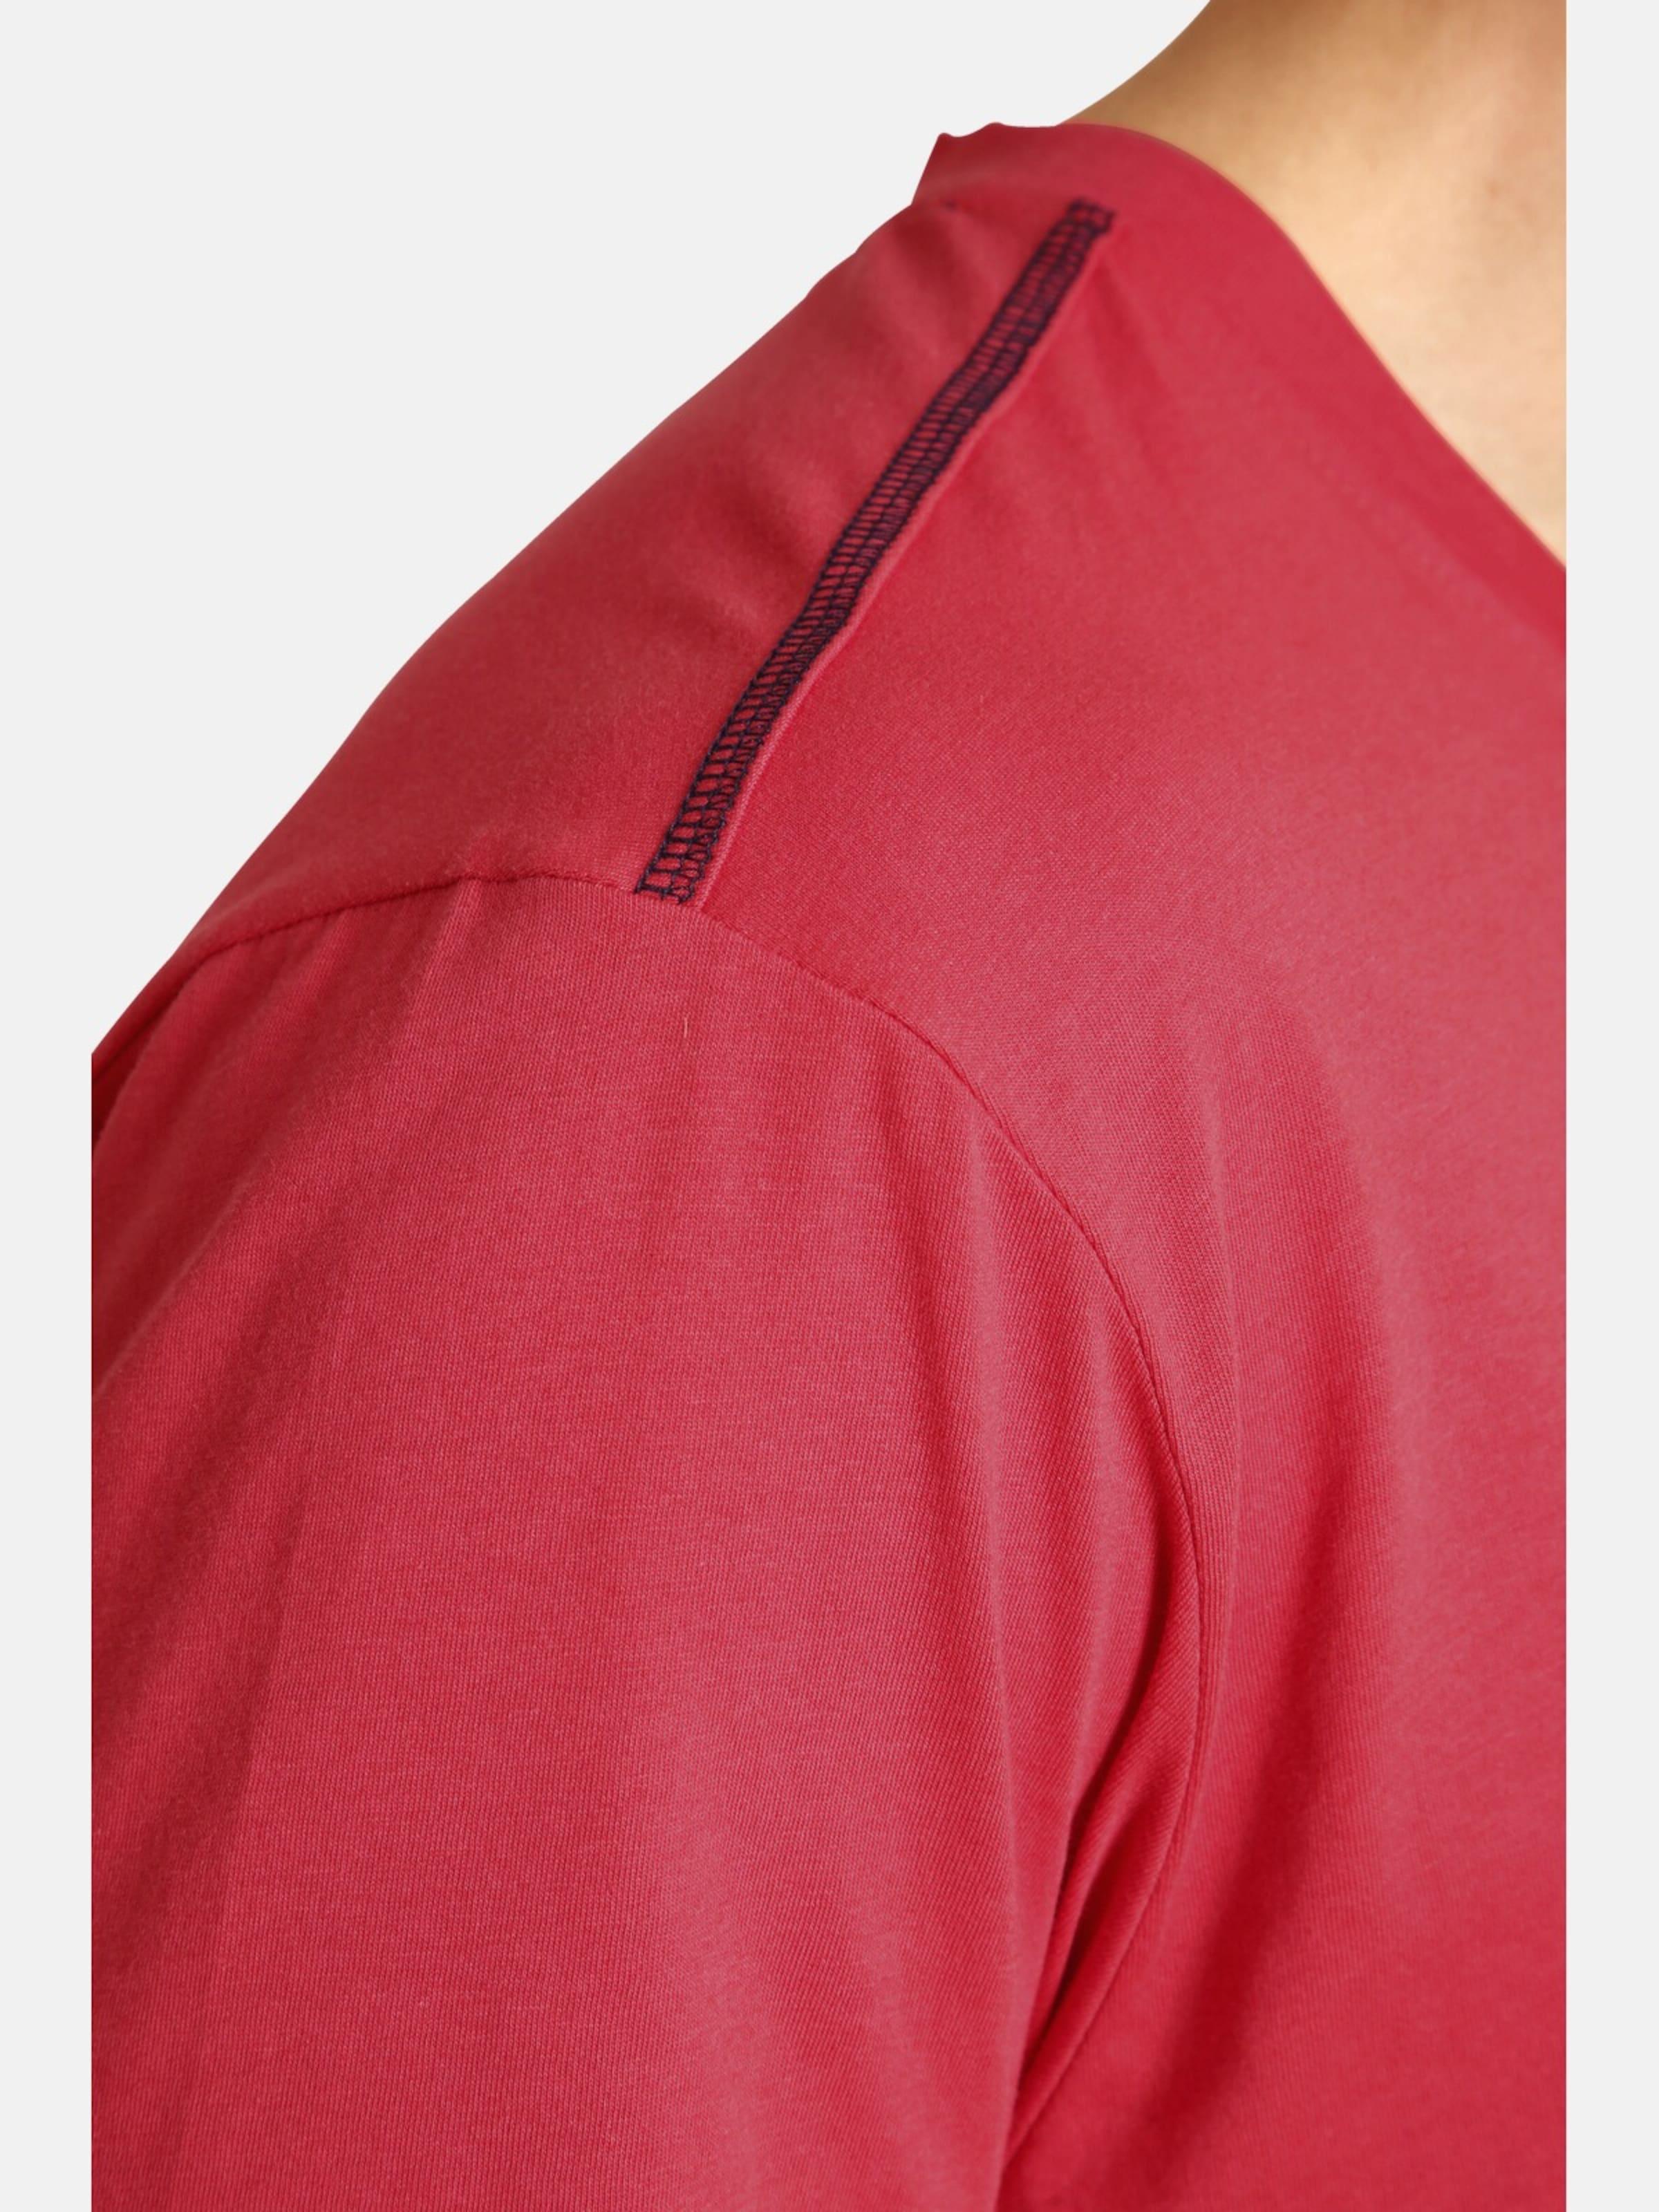 T 'samu' In Jan Vanderstorm shirt DunkelblauHellrot m0vNw8n